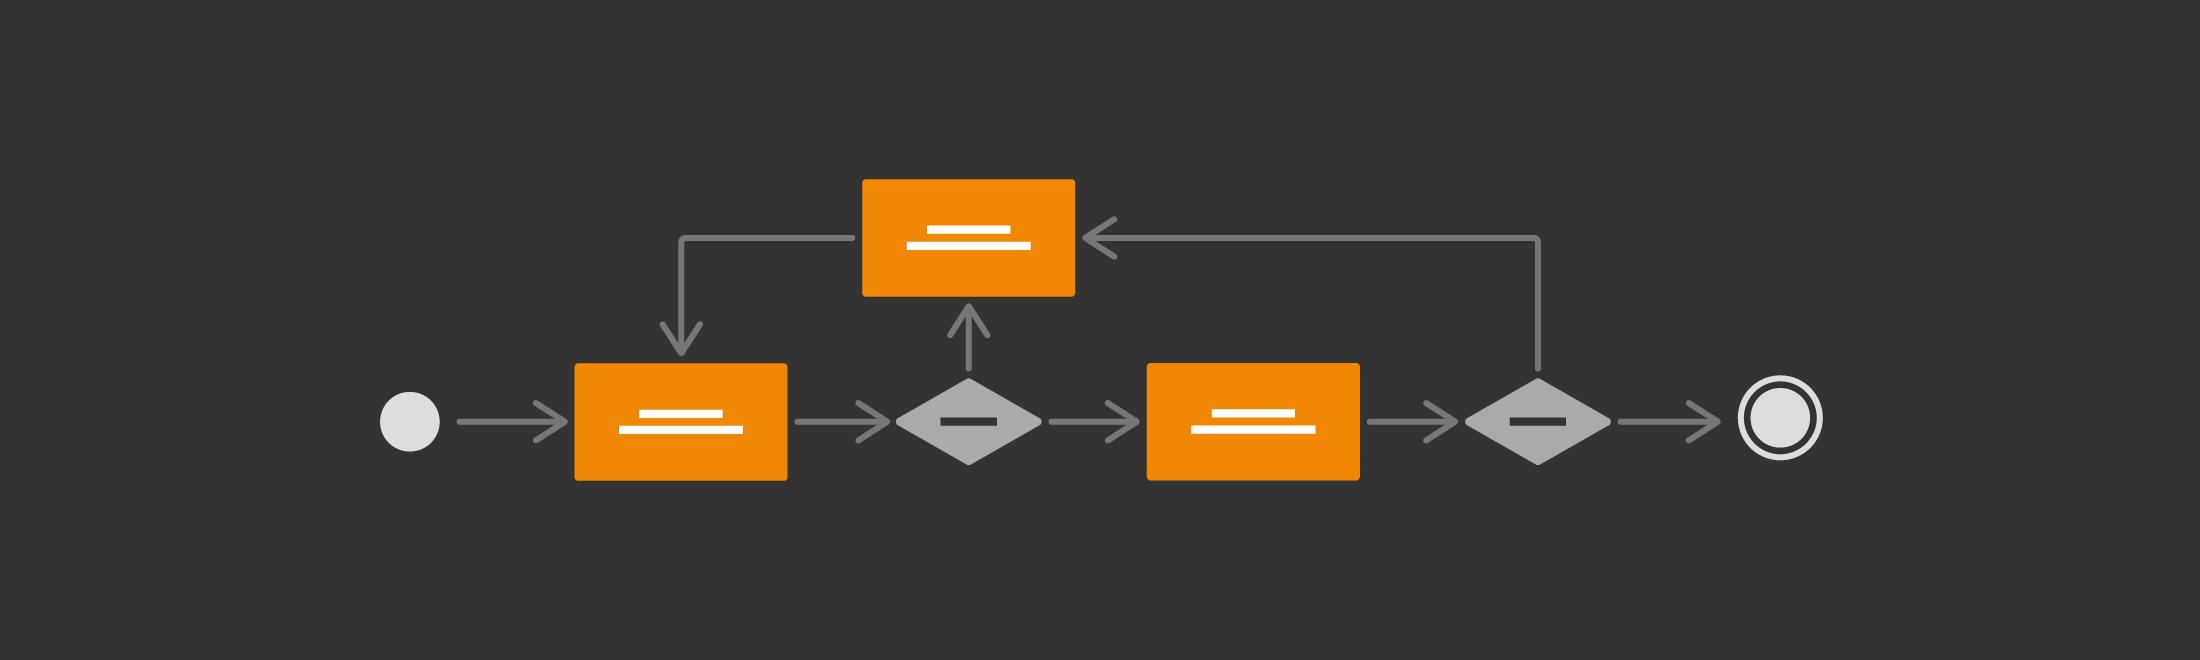 activity diagrams Archives - draw.io